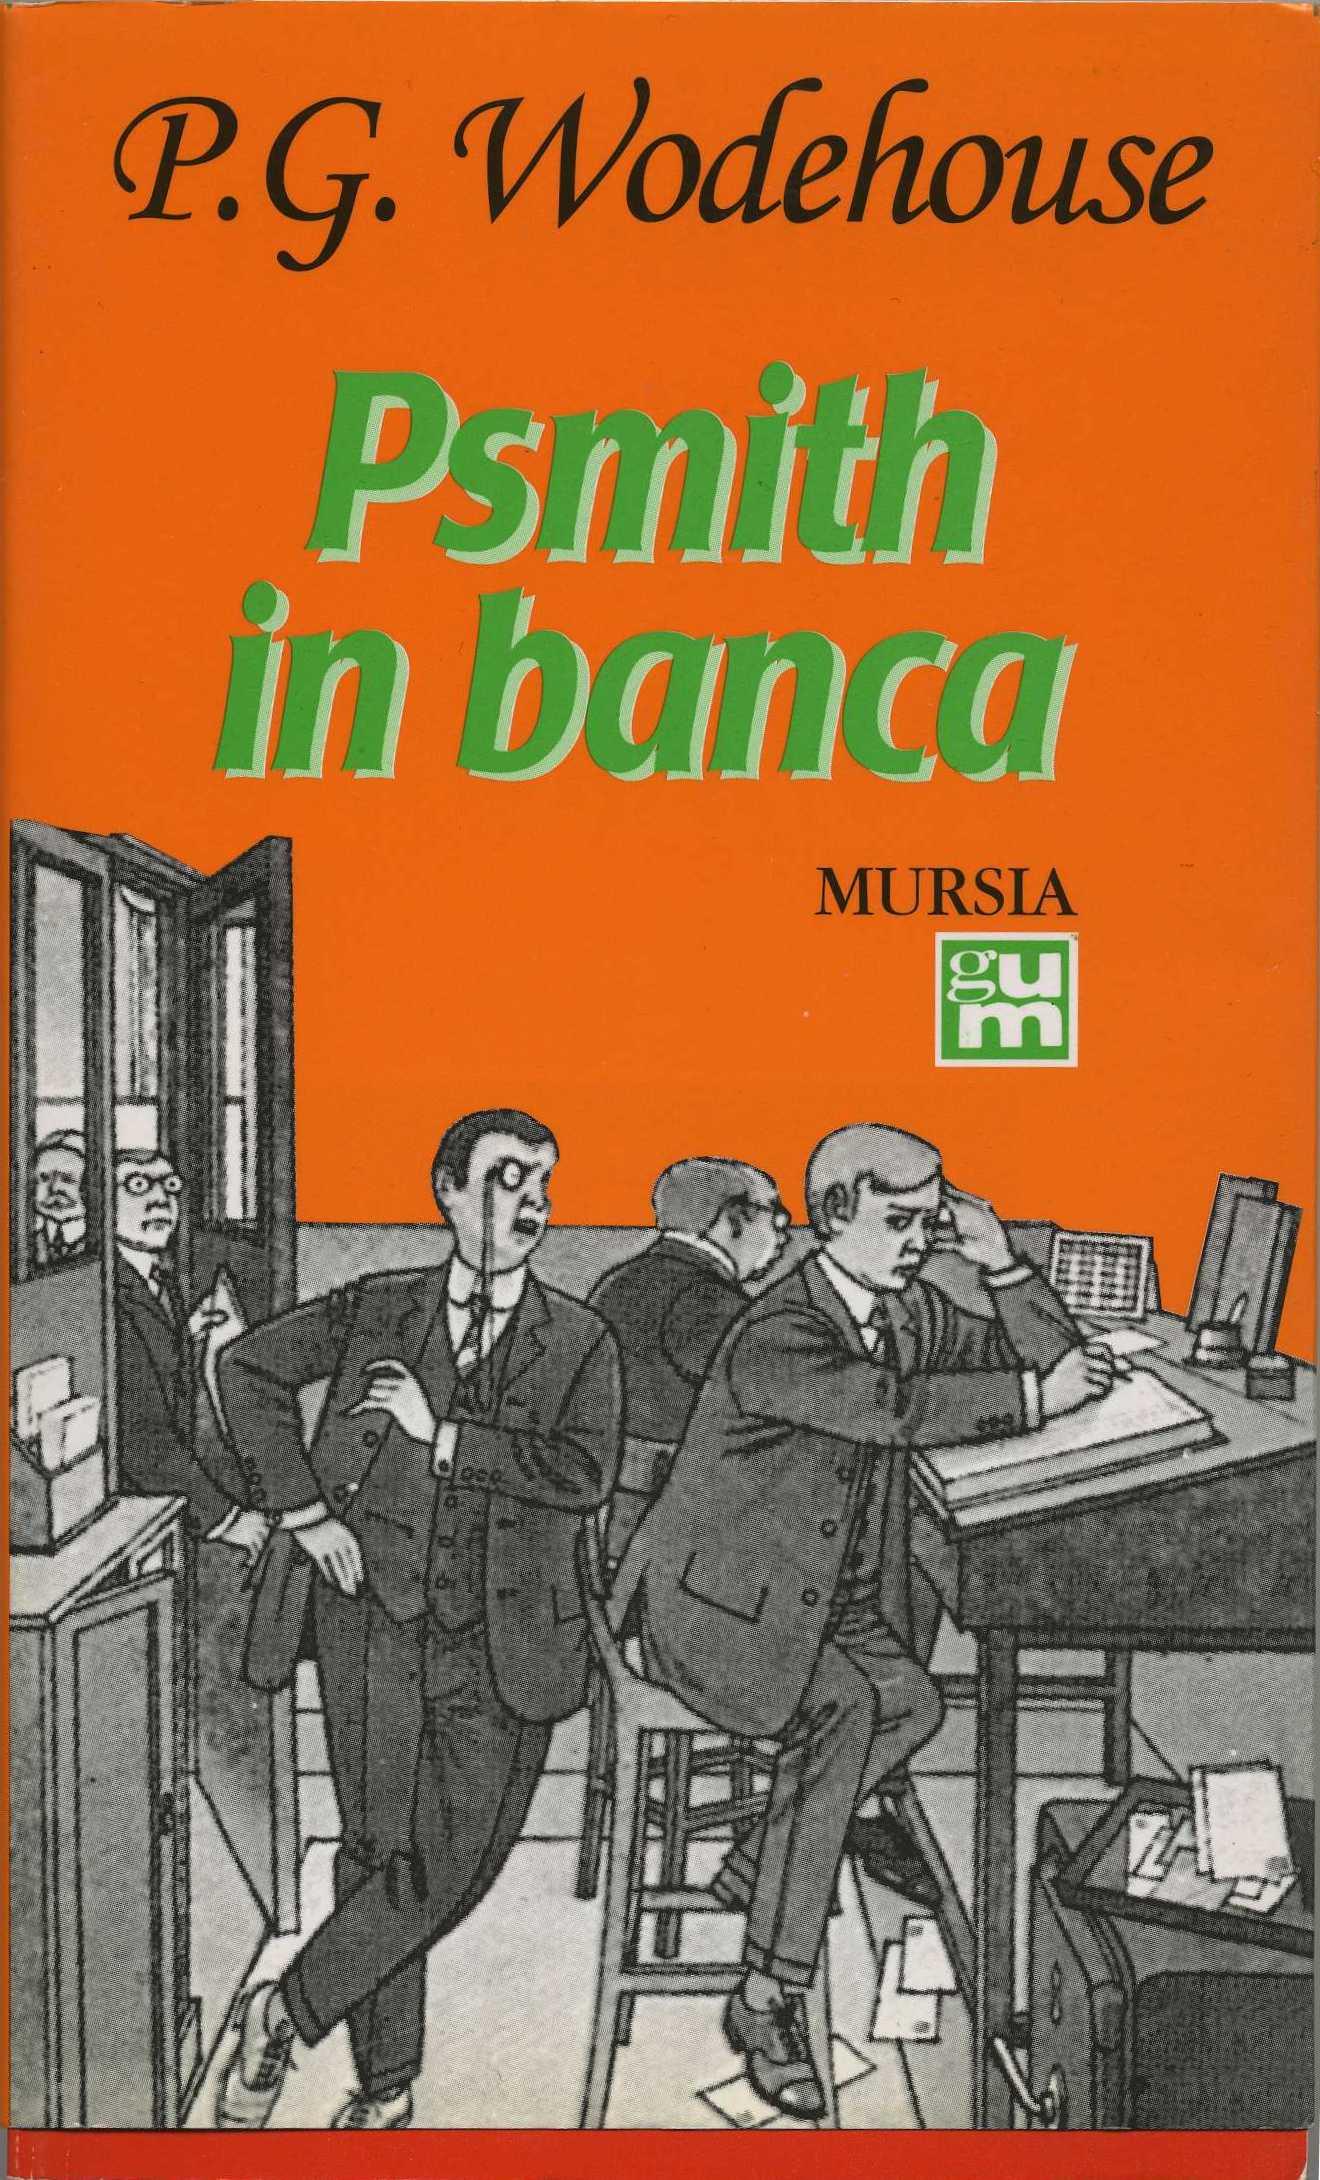 Psmith in banca